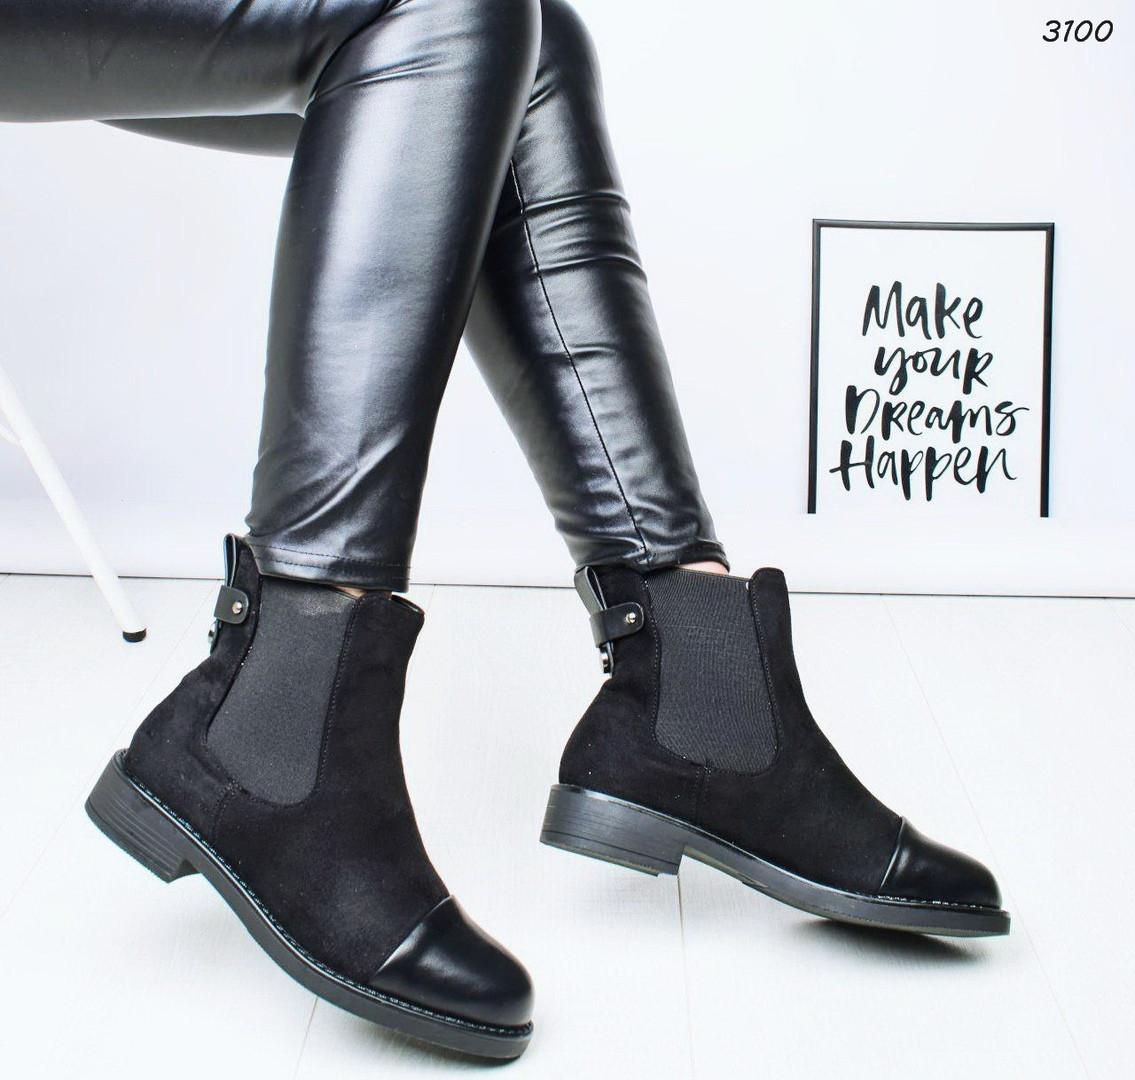 Ботинки женские побокам резинки низкий каблук 3100